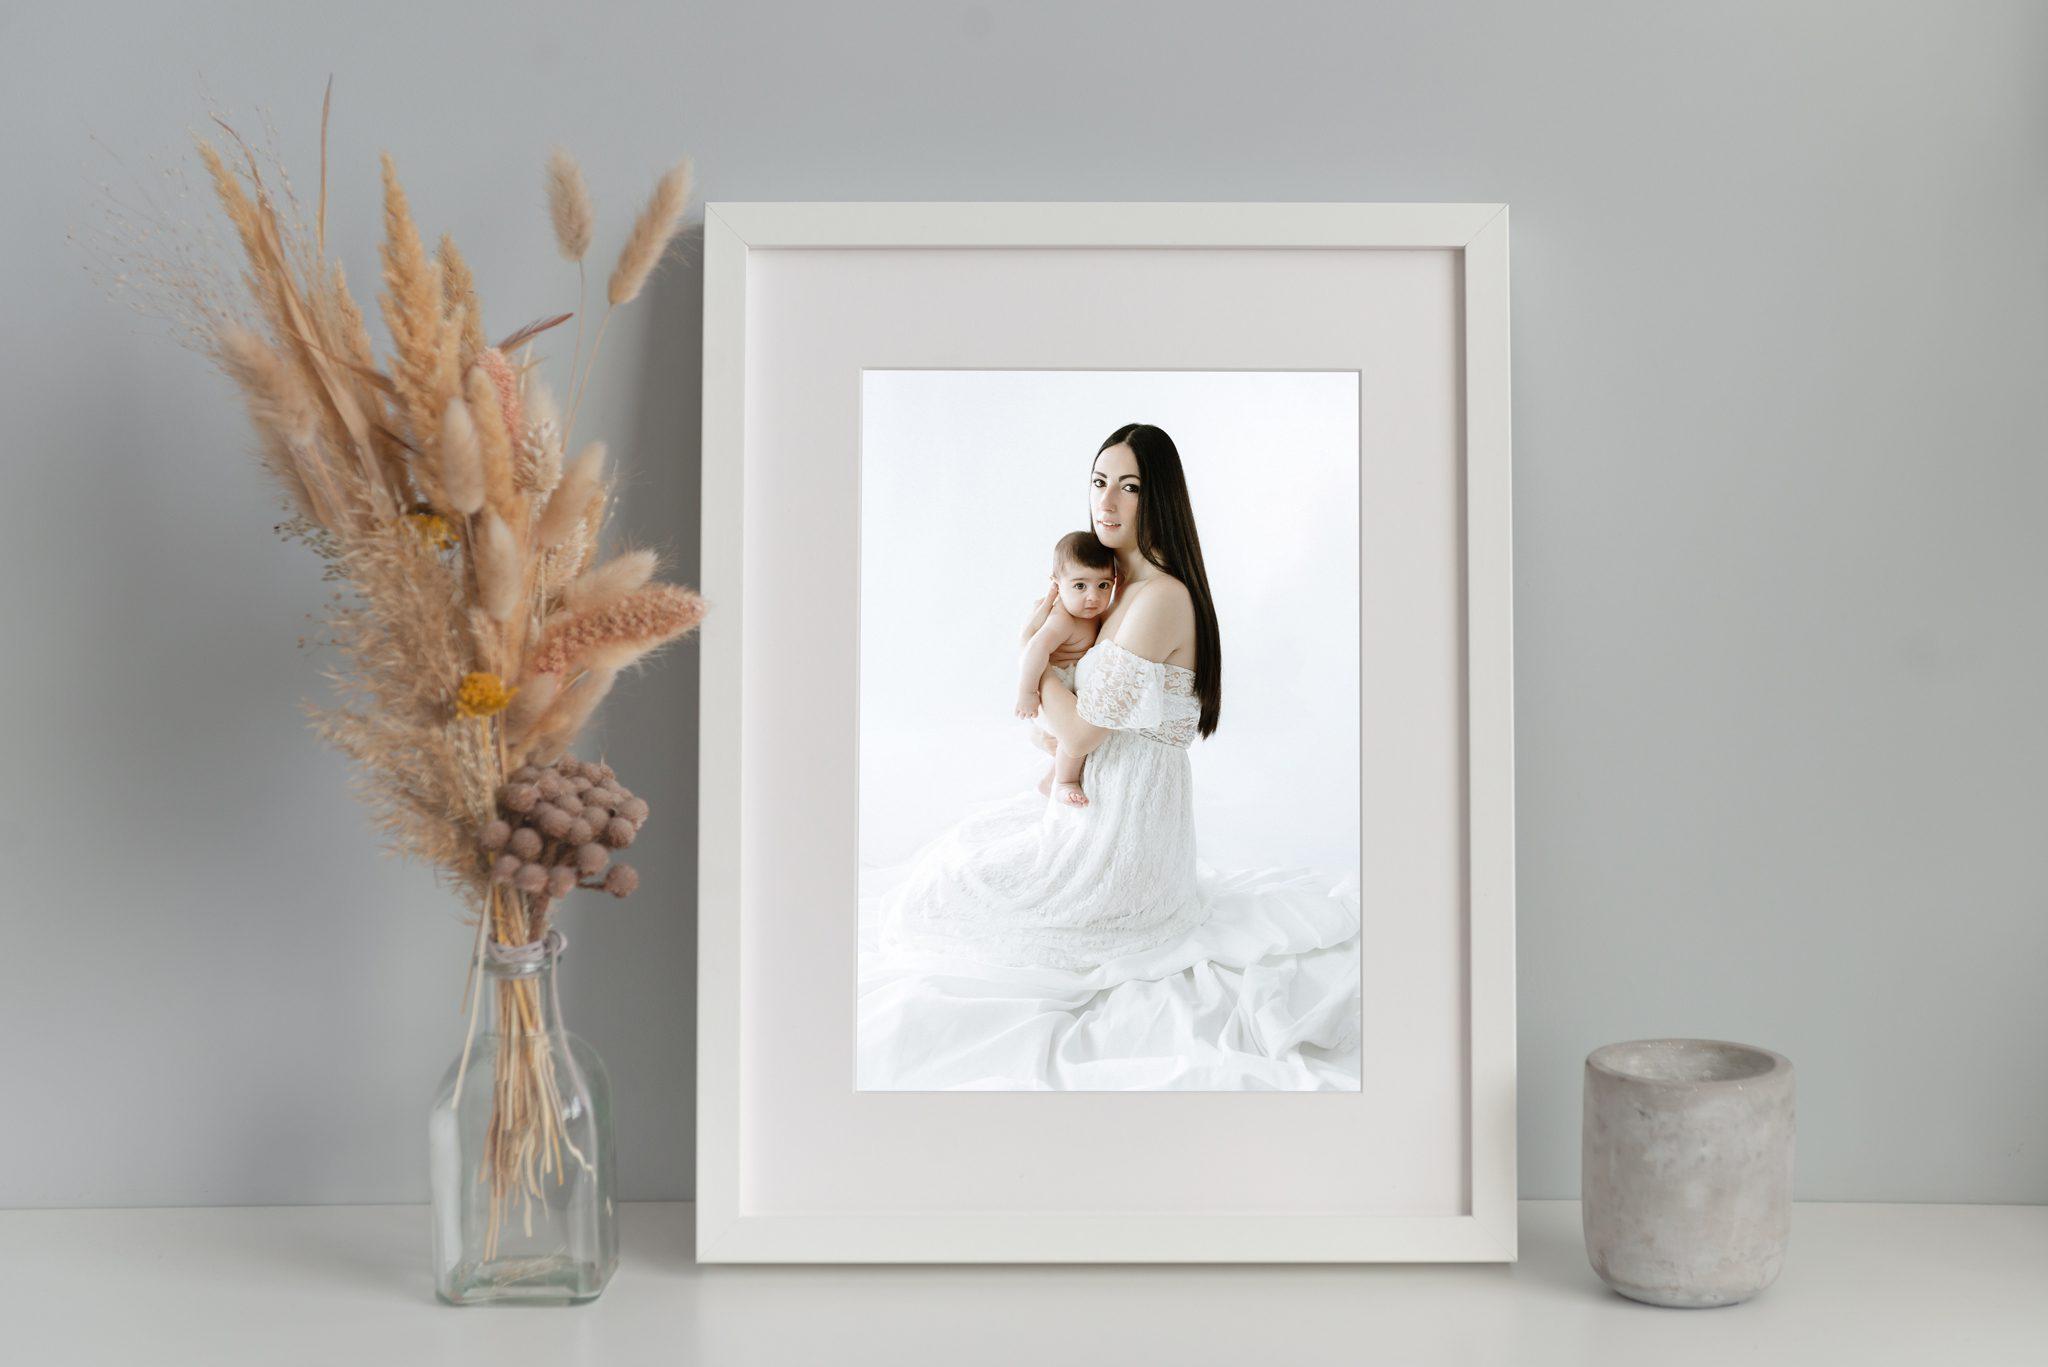 Fotografie dalla nascita